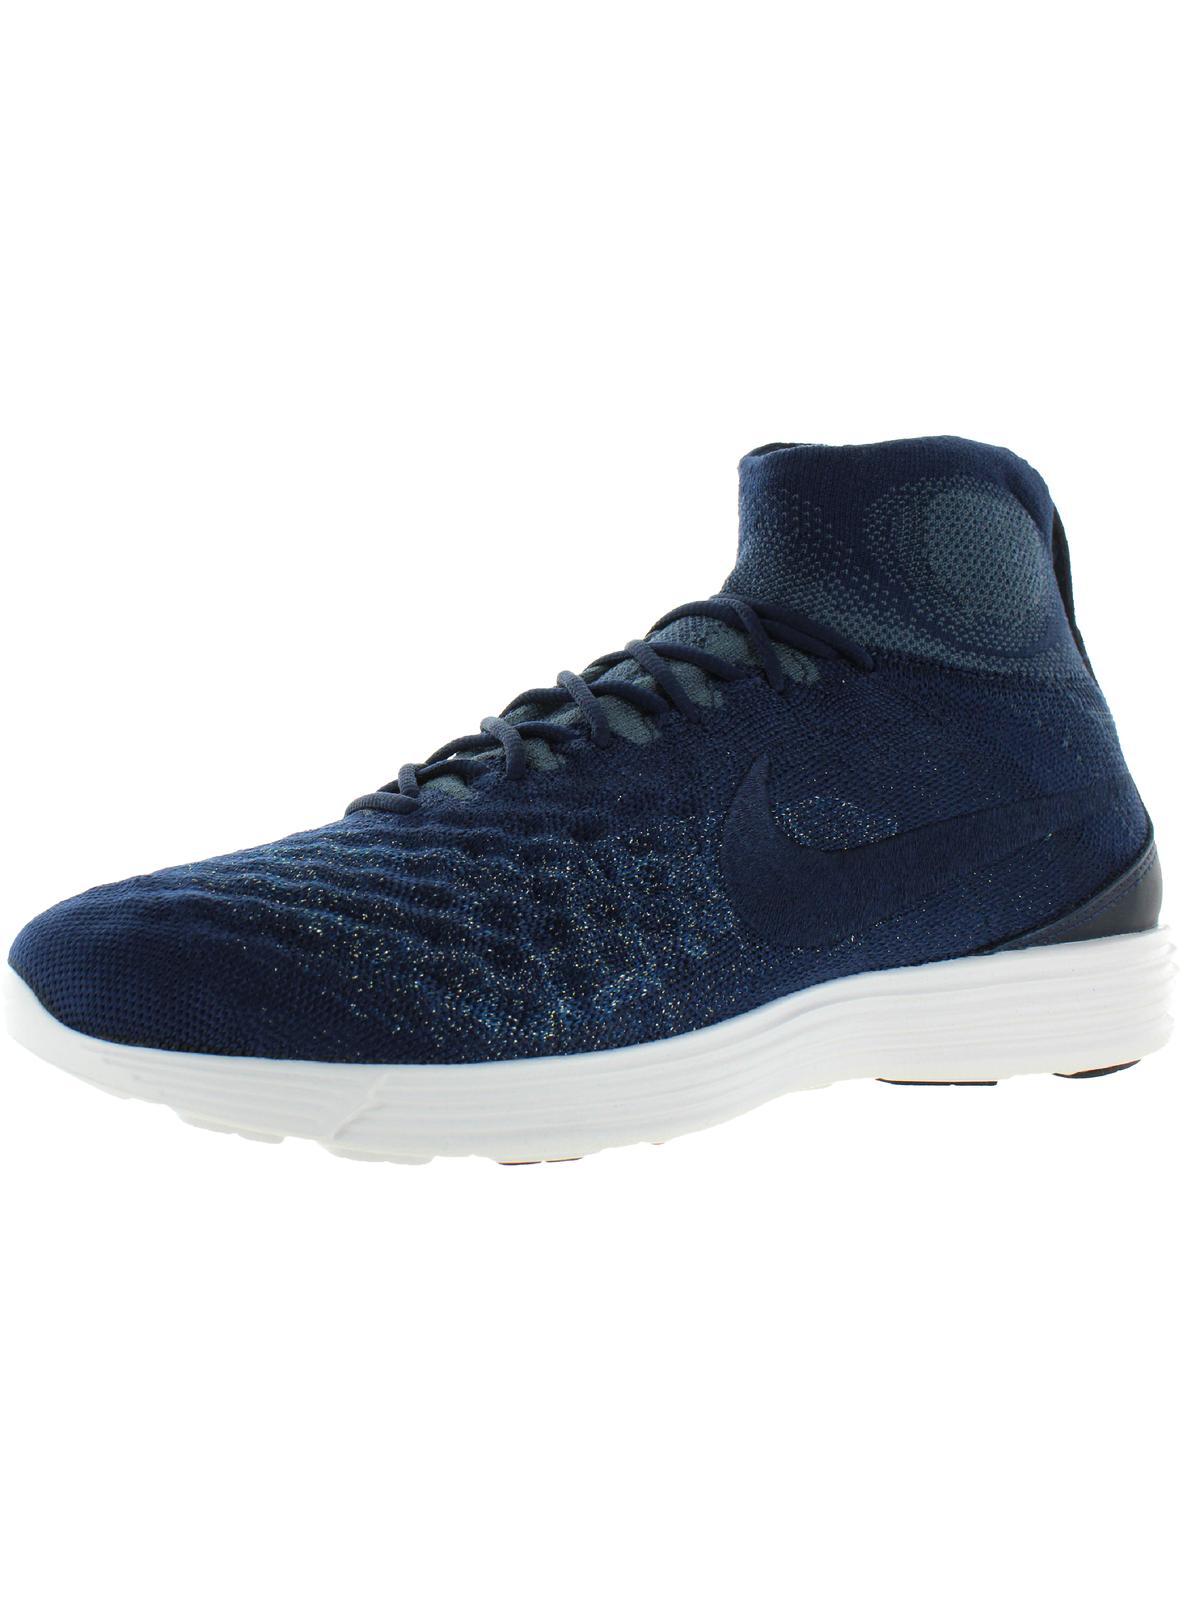 Nike - Nike Mens Lunar Magista II FK FC